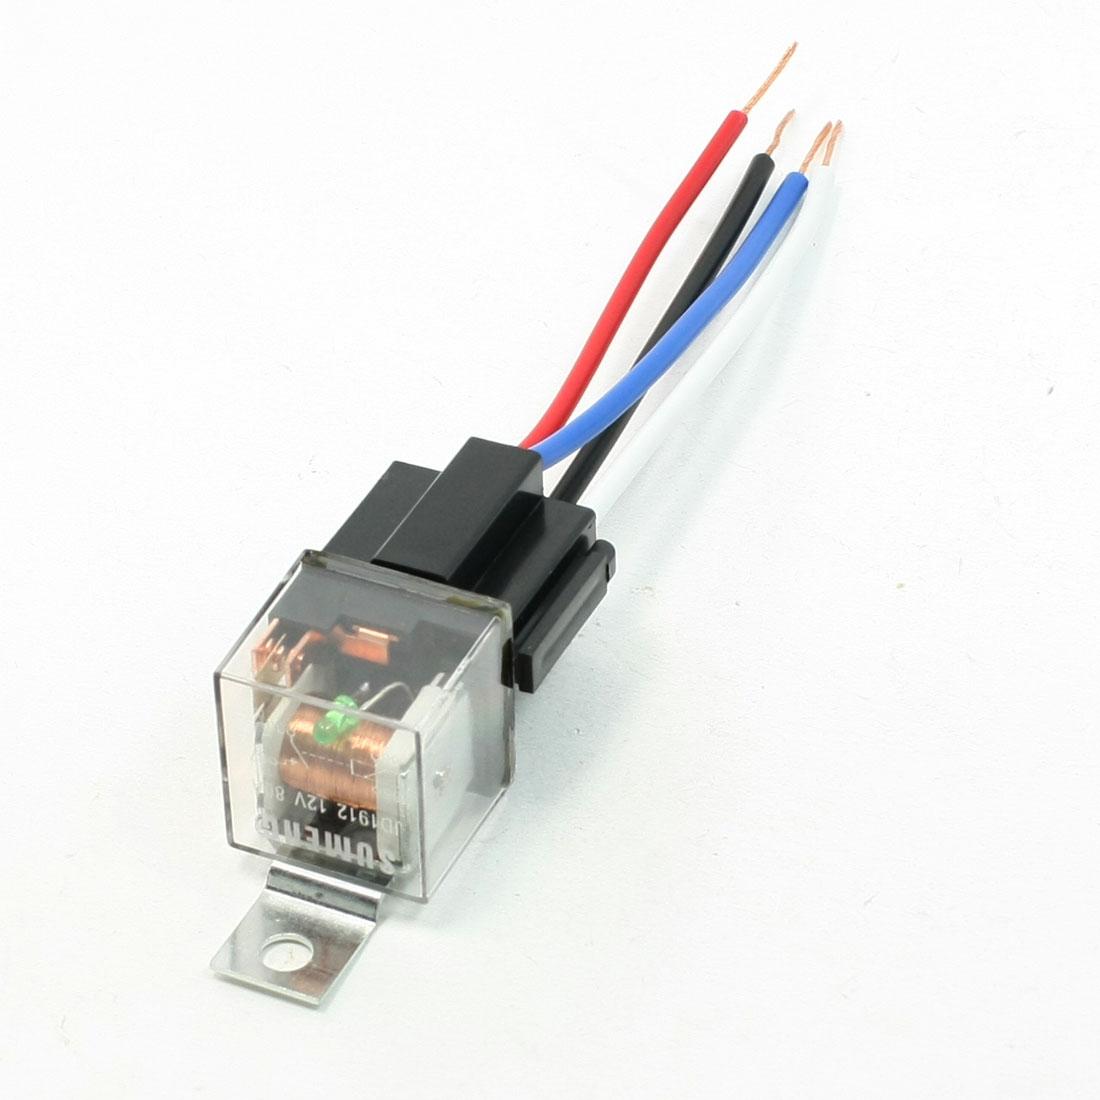 DC12V 80A 4P Female Socket 4 Wires Green Indicator N/C SPST Car Relay 10 PCS